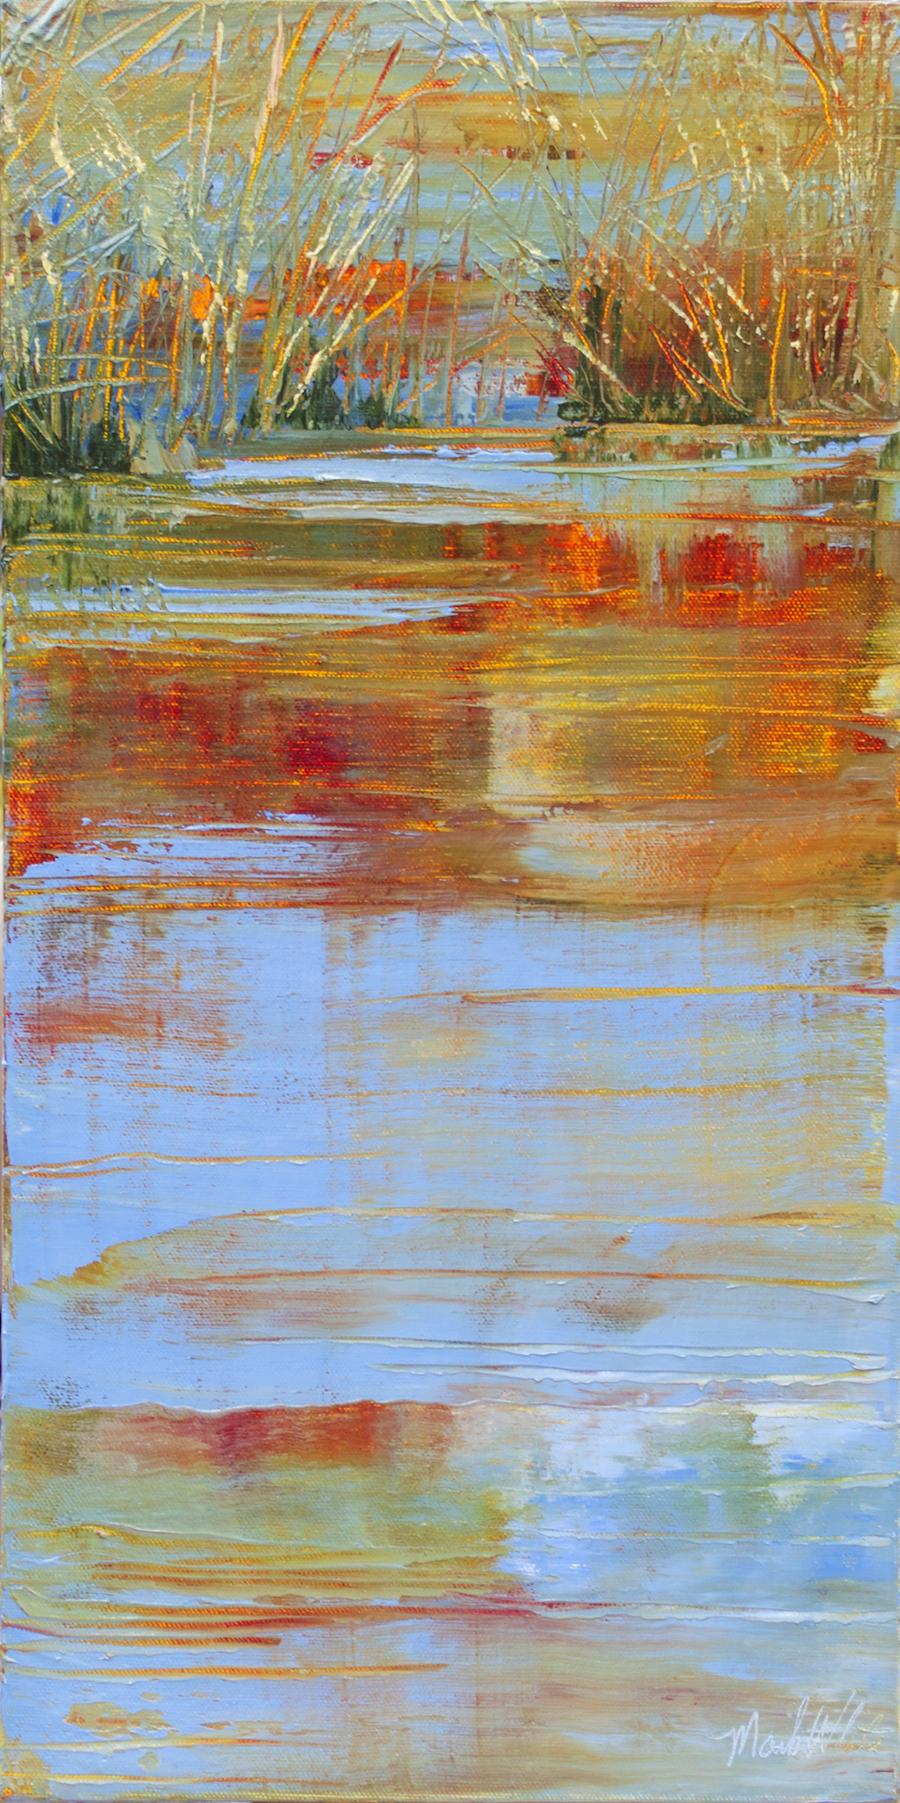 Mark White, Pond's Grassy Edge II, oil on canvas, 20 x 10 inches, $1,100